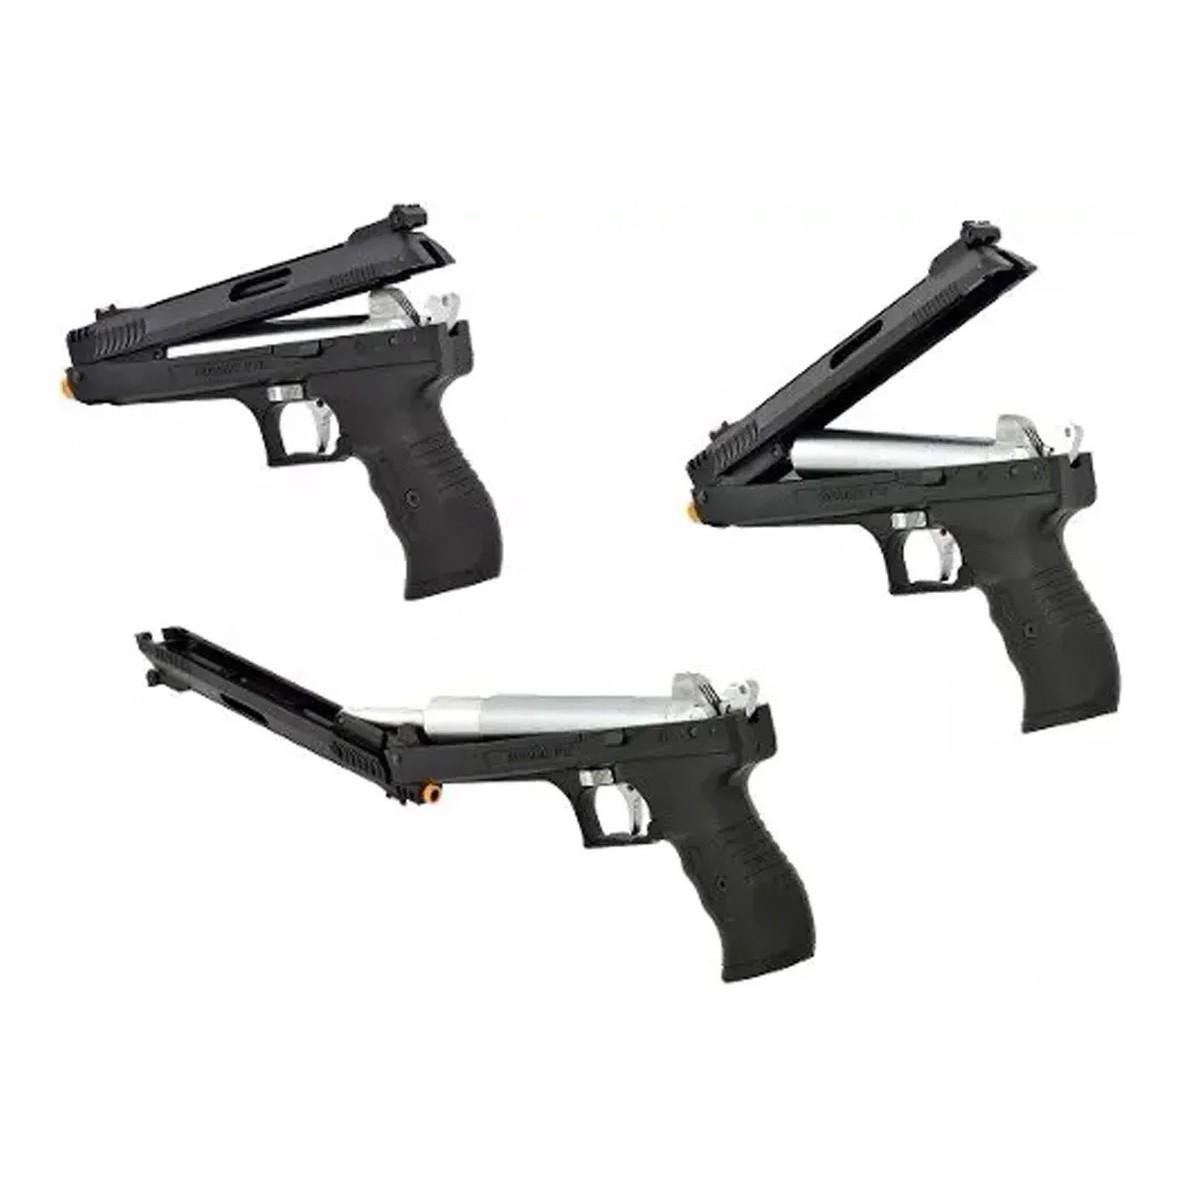 Pistola de Pressão Chumbinho Beeman 2004 Airgun 4.5mm